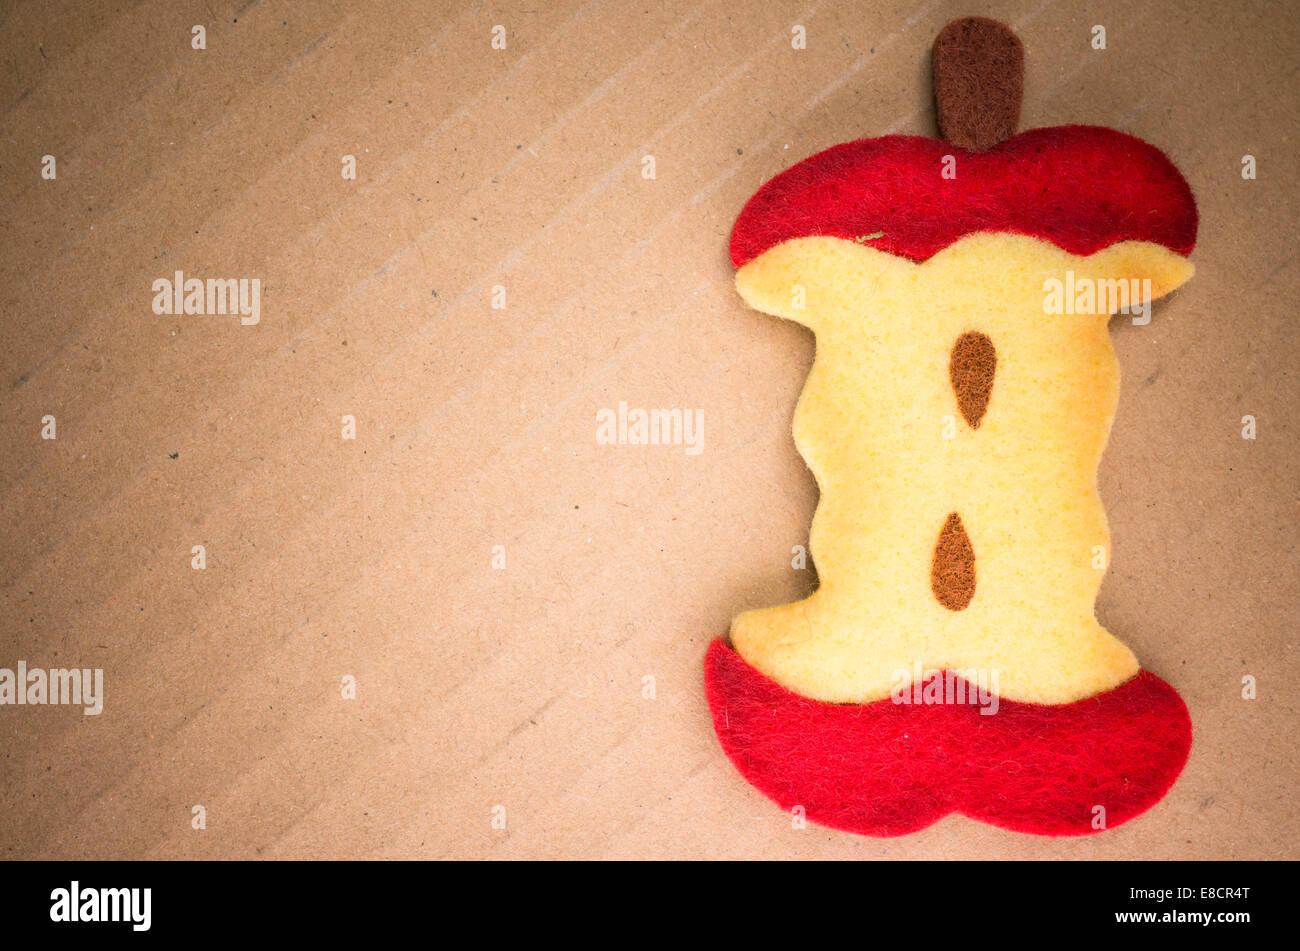 felt apple core on a cardboard surface - Stock Image